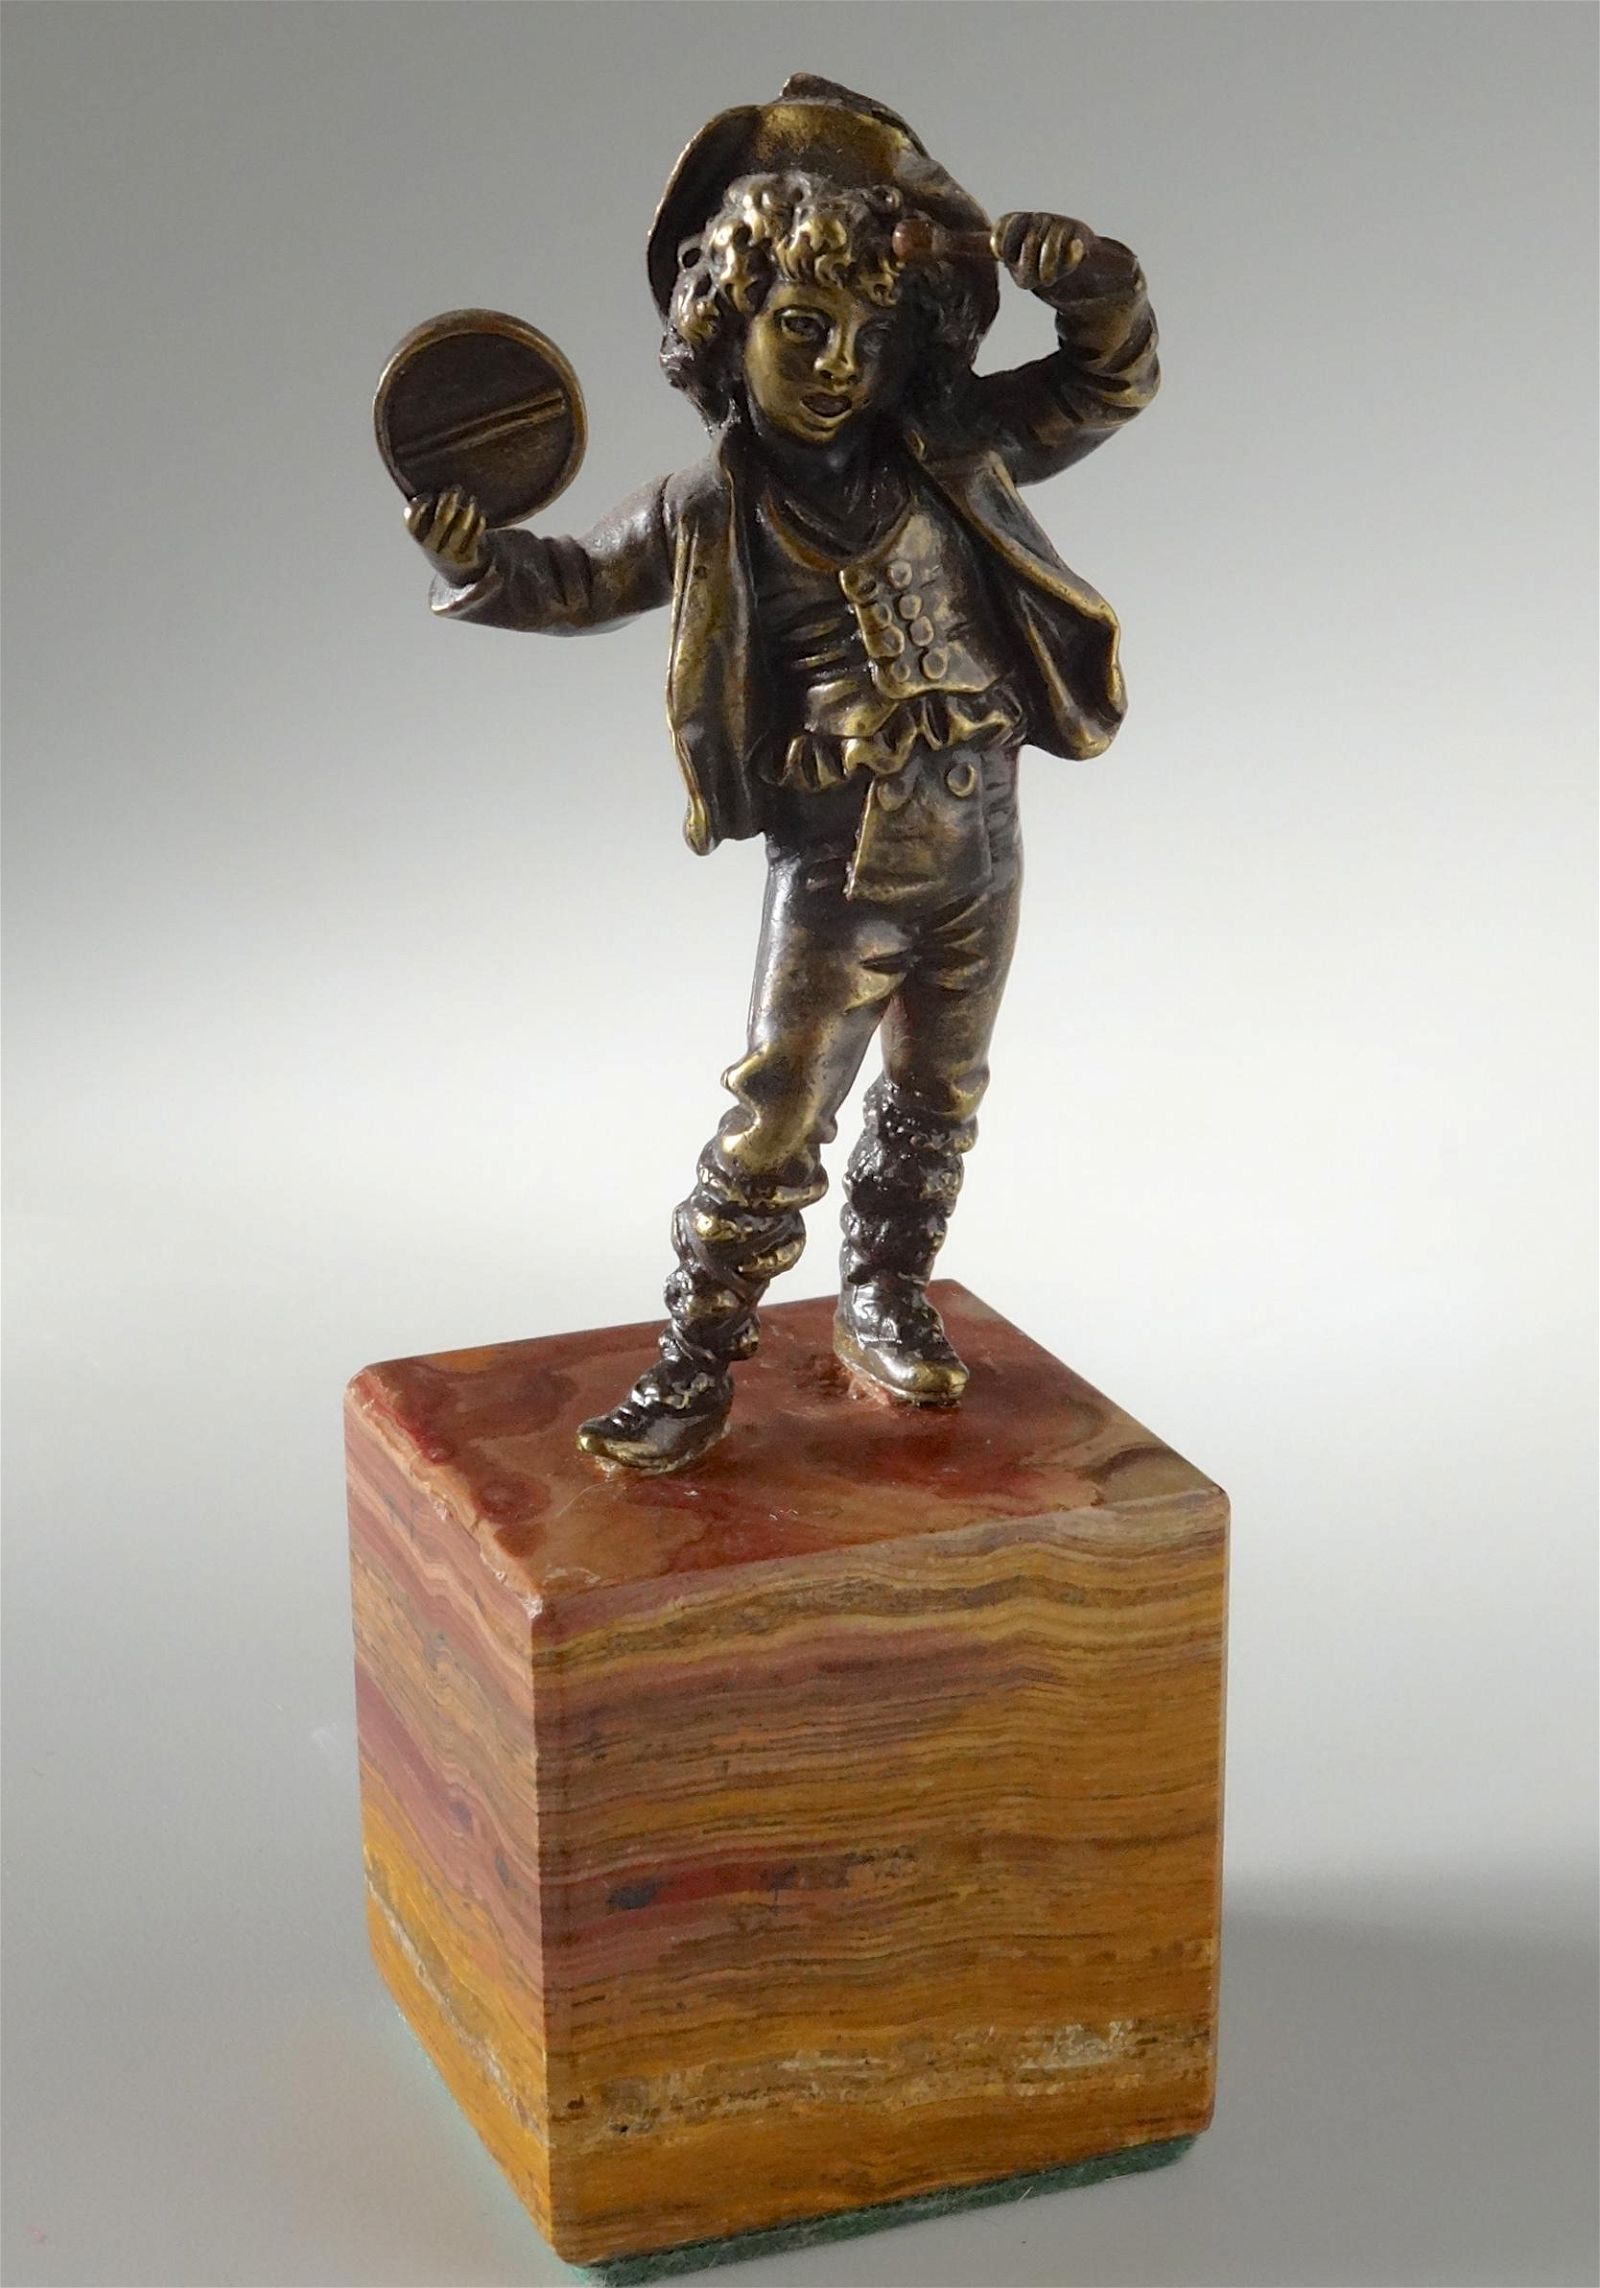 Italian Antique Bronze Boy with Tambourine Figurine